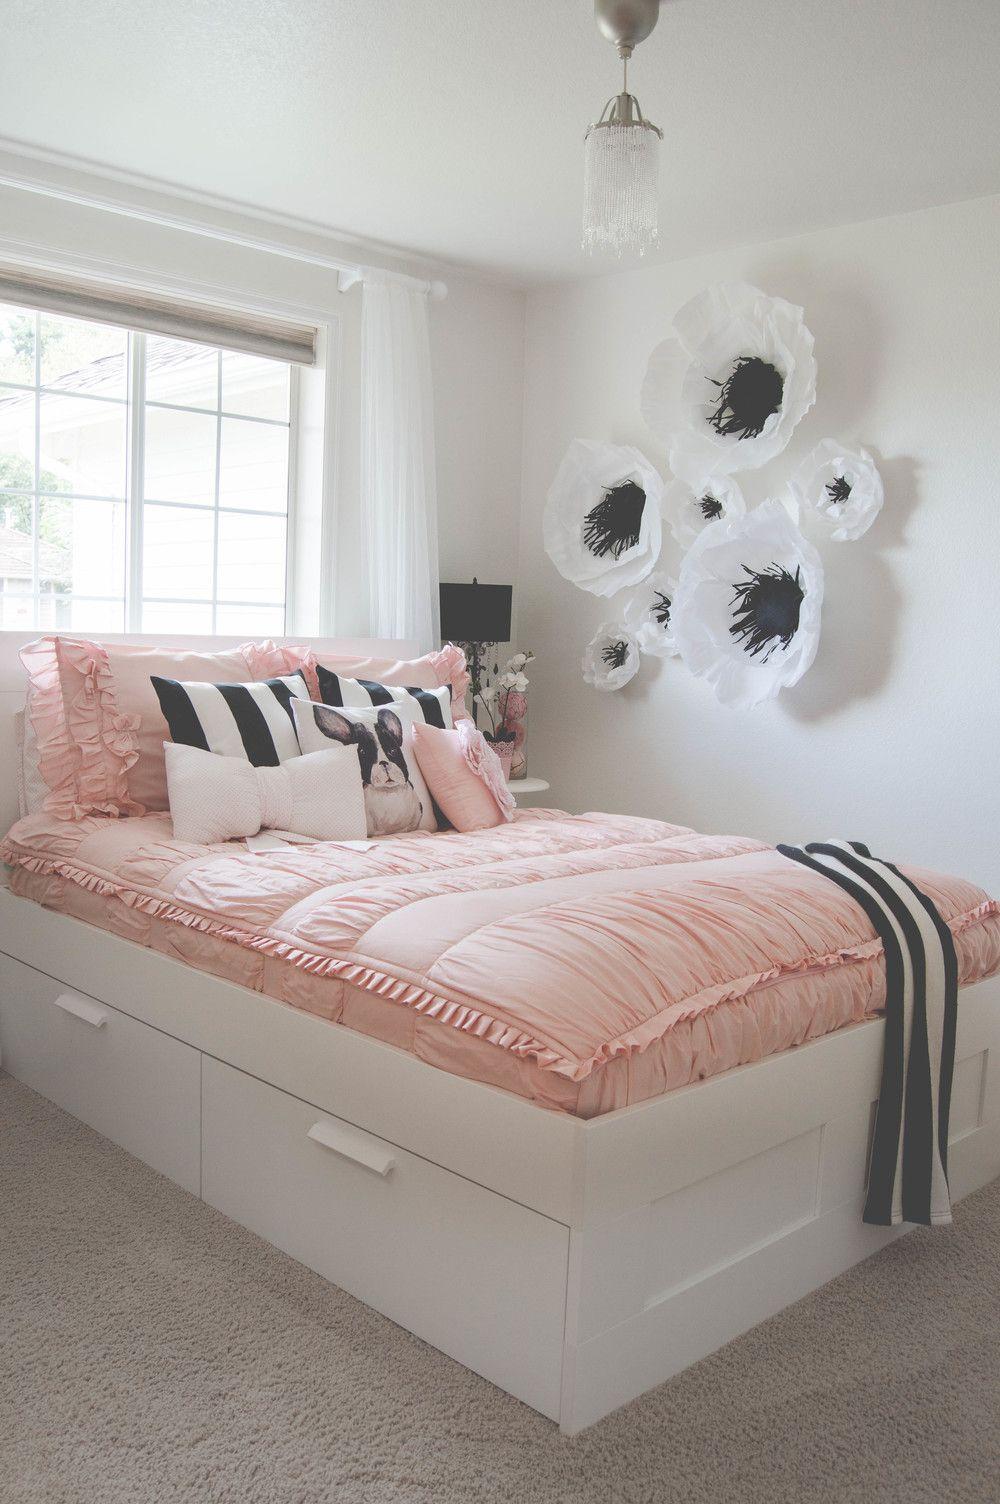 Room Designs For Girl: Little Girl Bedroom Makeover: The Details